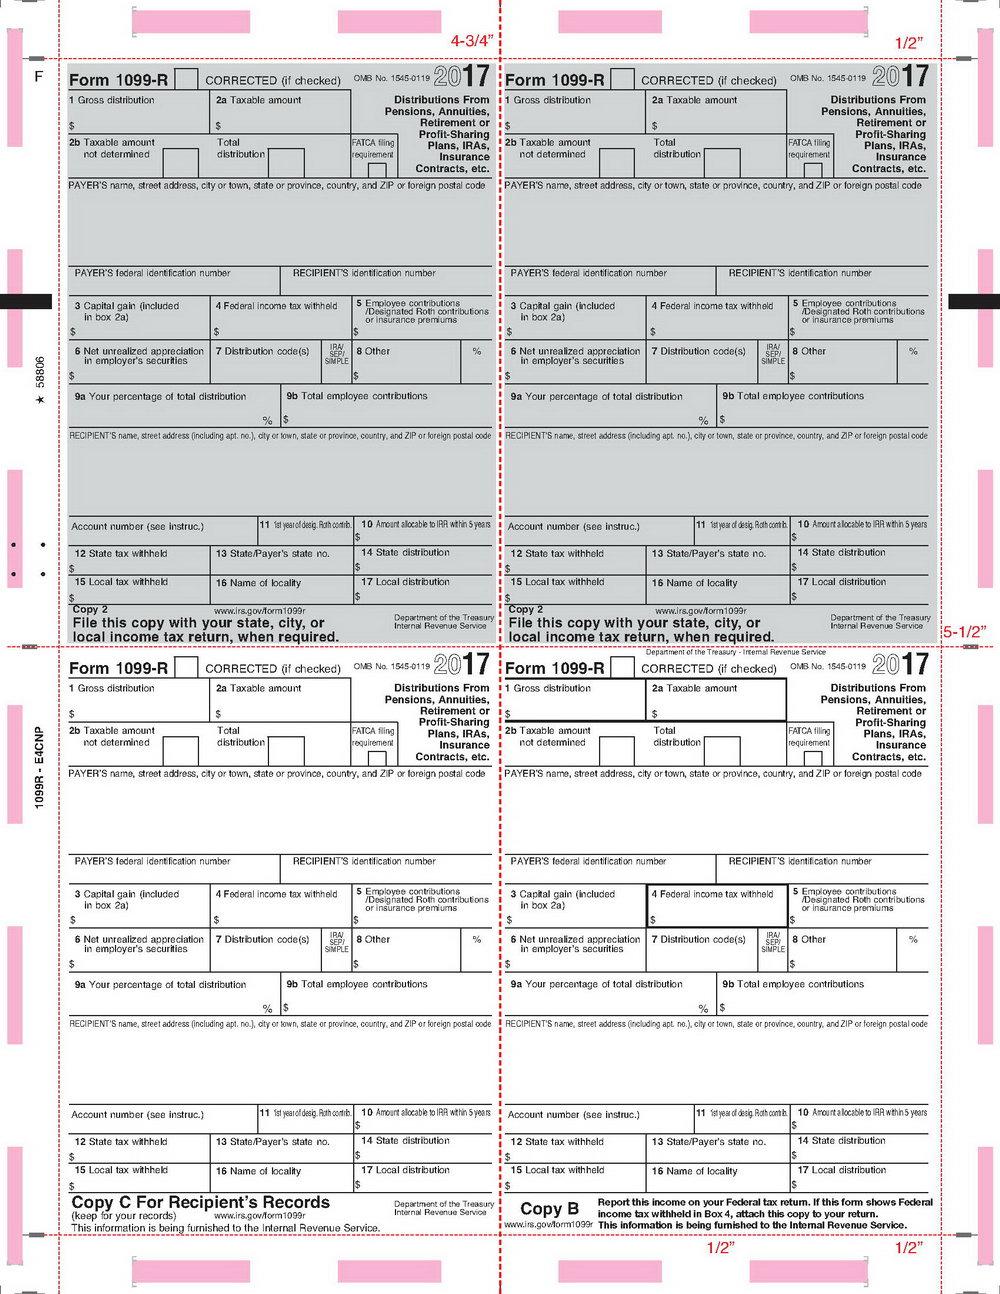 Irs Form 1099 B 2017